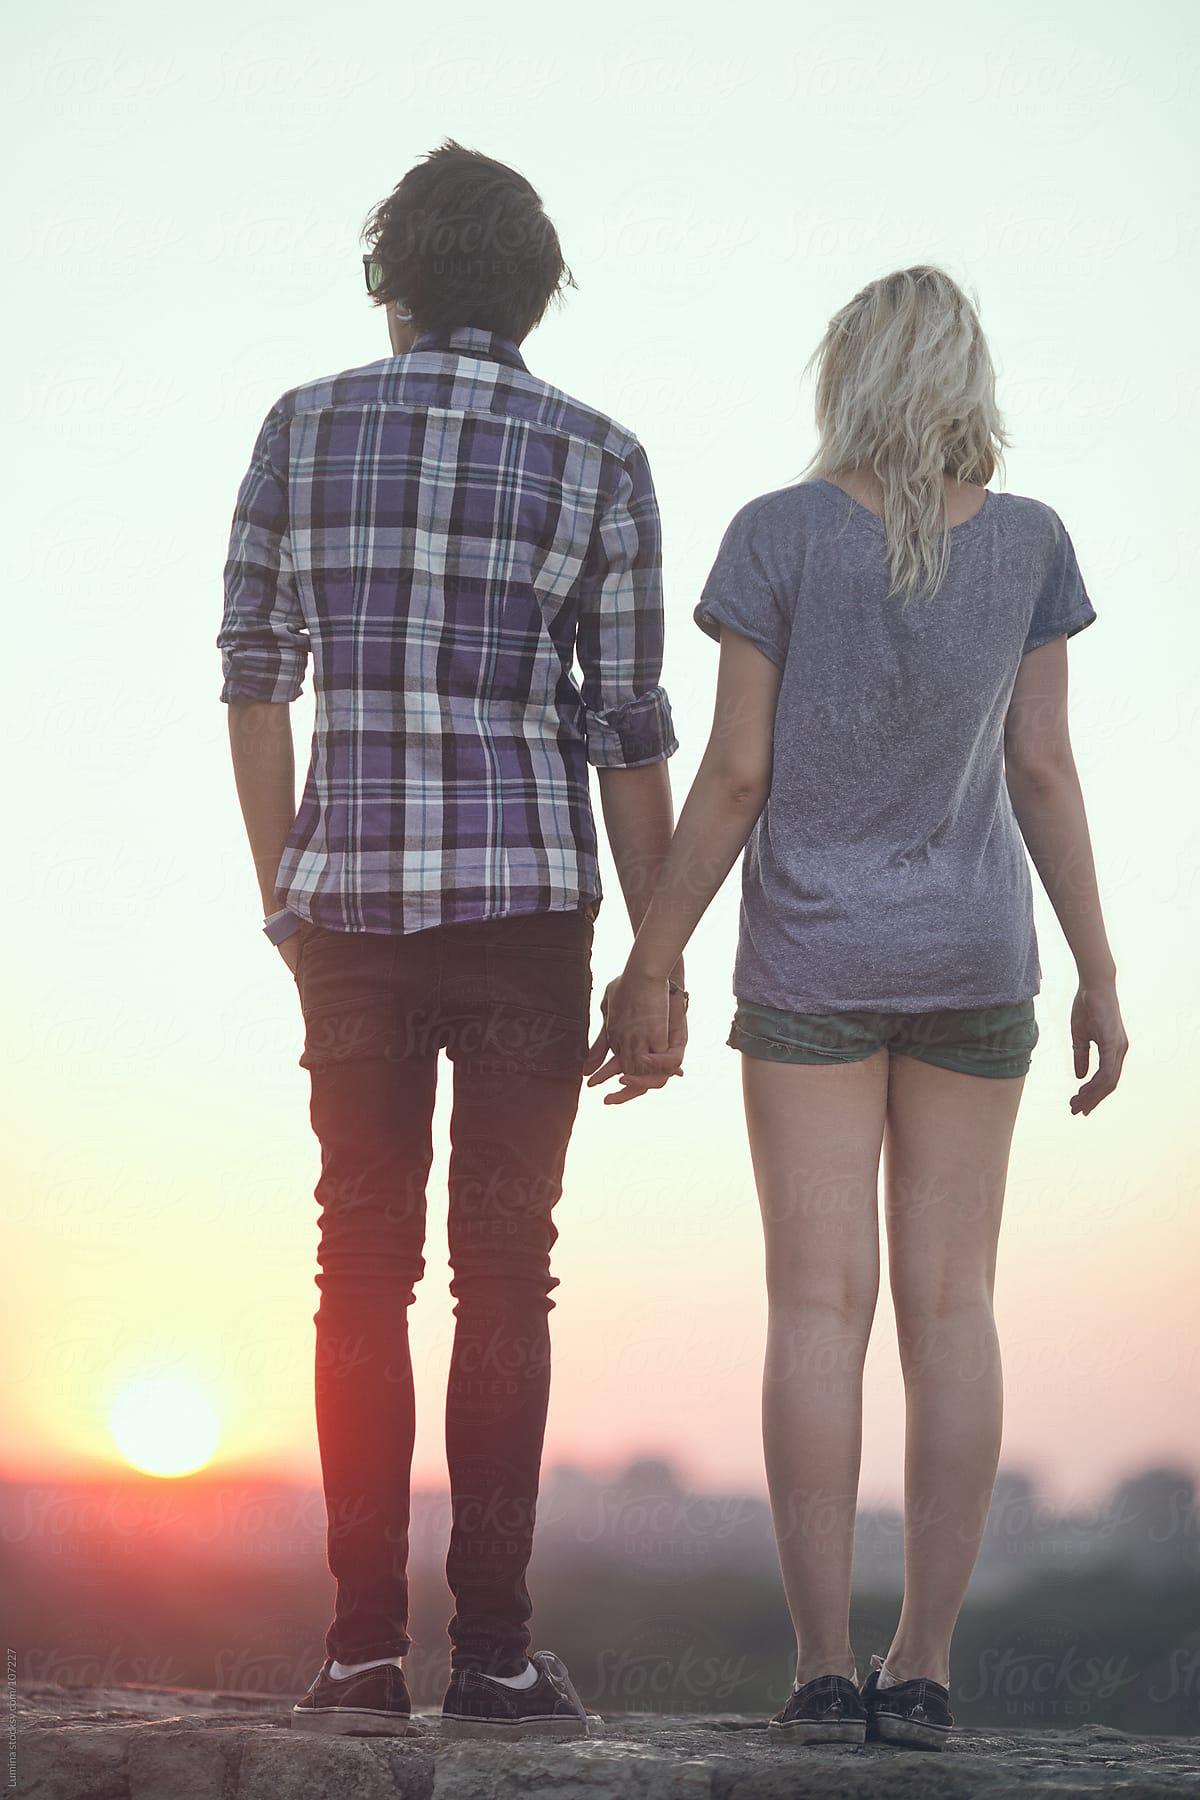 Teenage Couple Holding Hands | Stocksy United